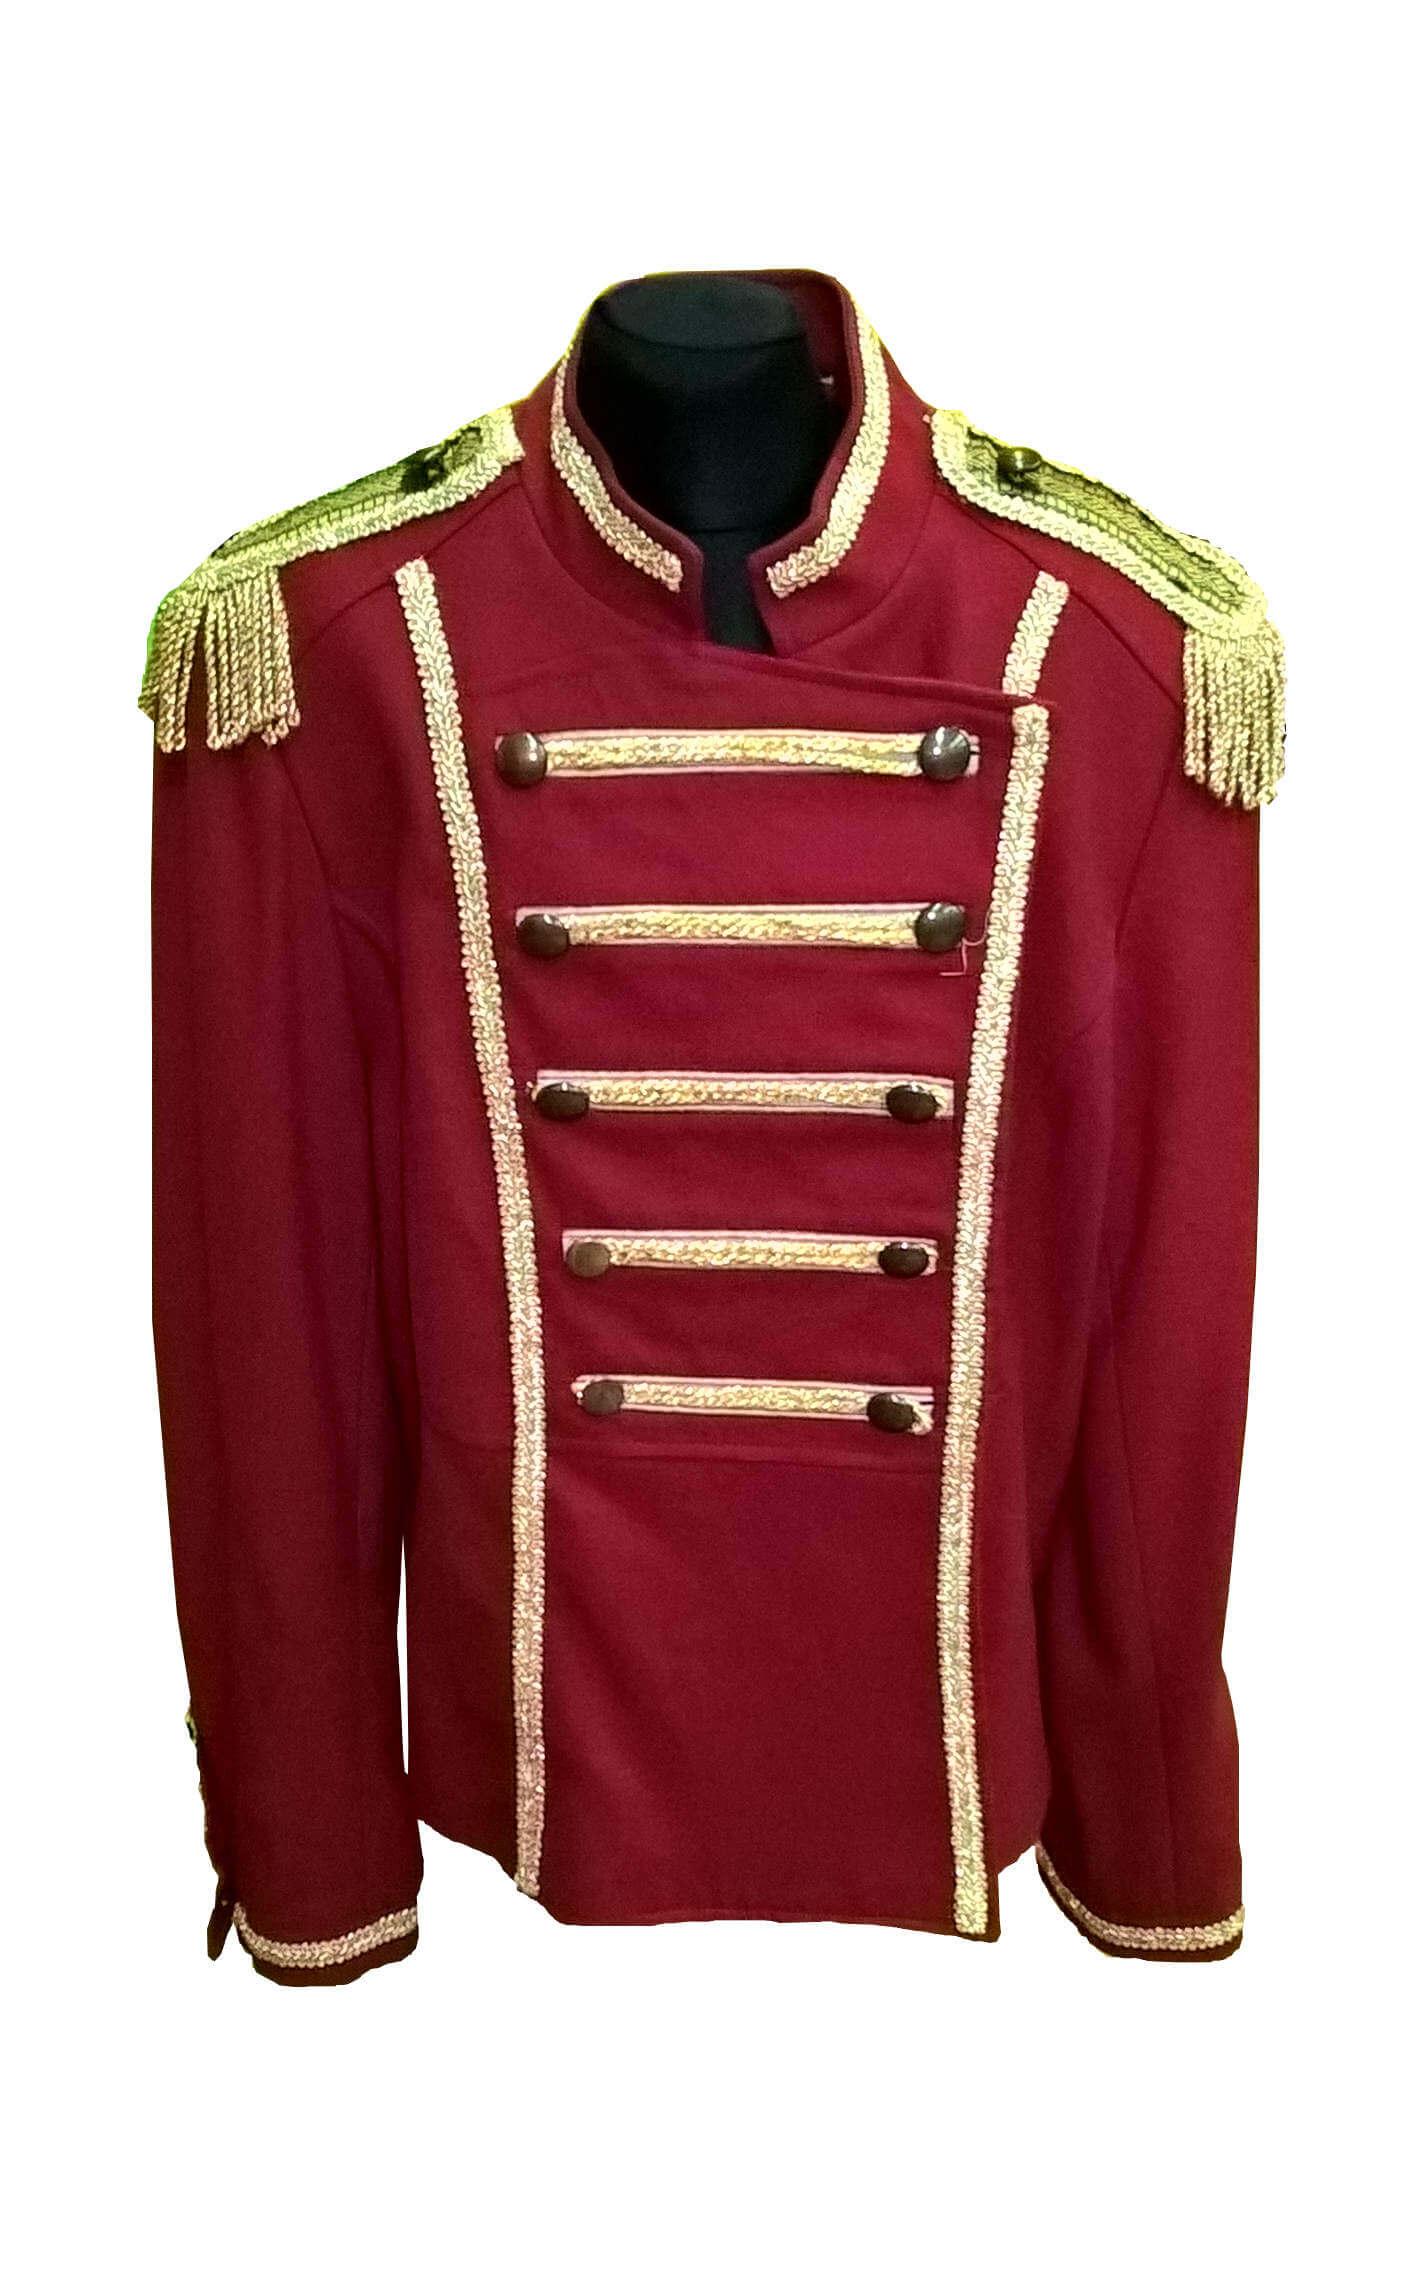 Kareivėlio kostiumas. Kaina 15 Eur.